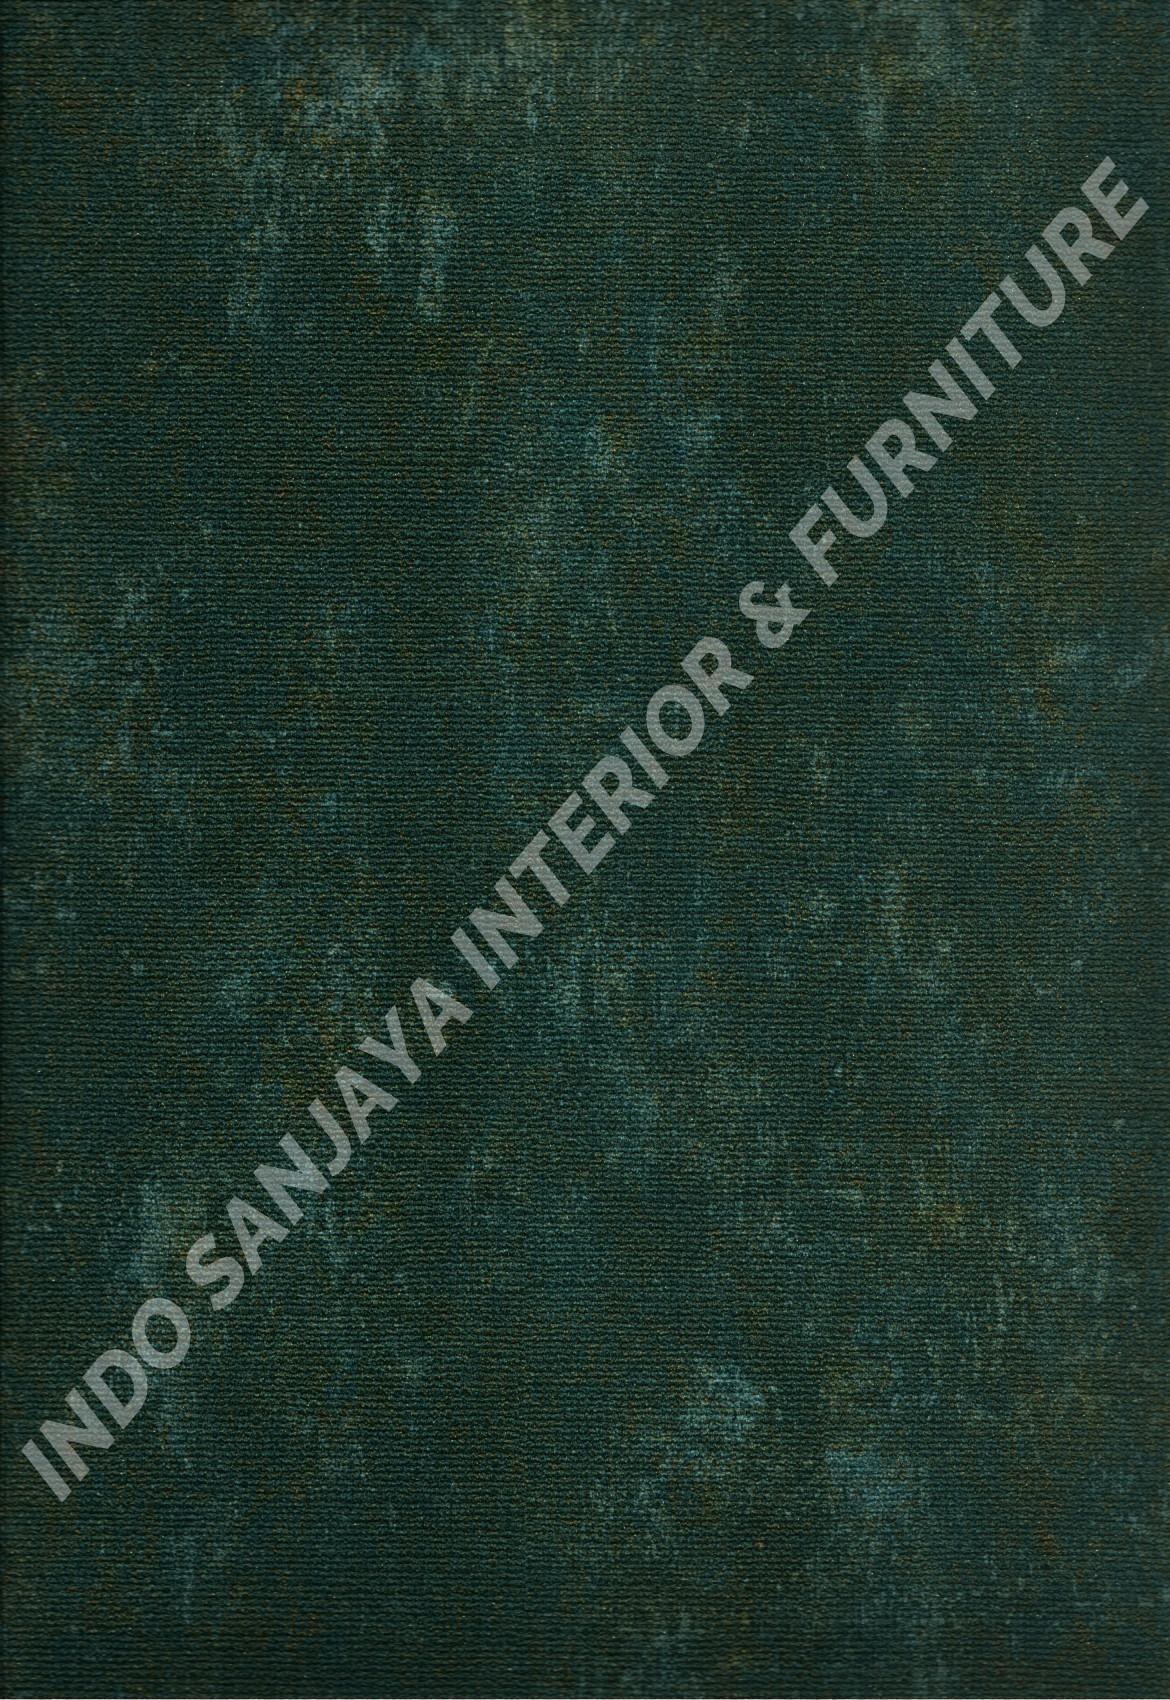 wallpaper   Wallpaper Minimalis Polos DL13206:DL13206 corak  warna